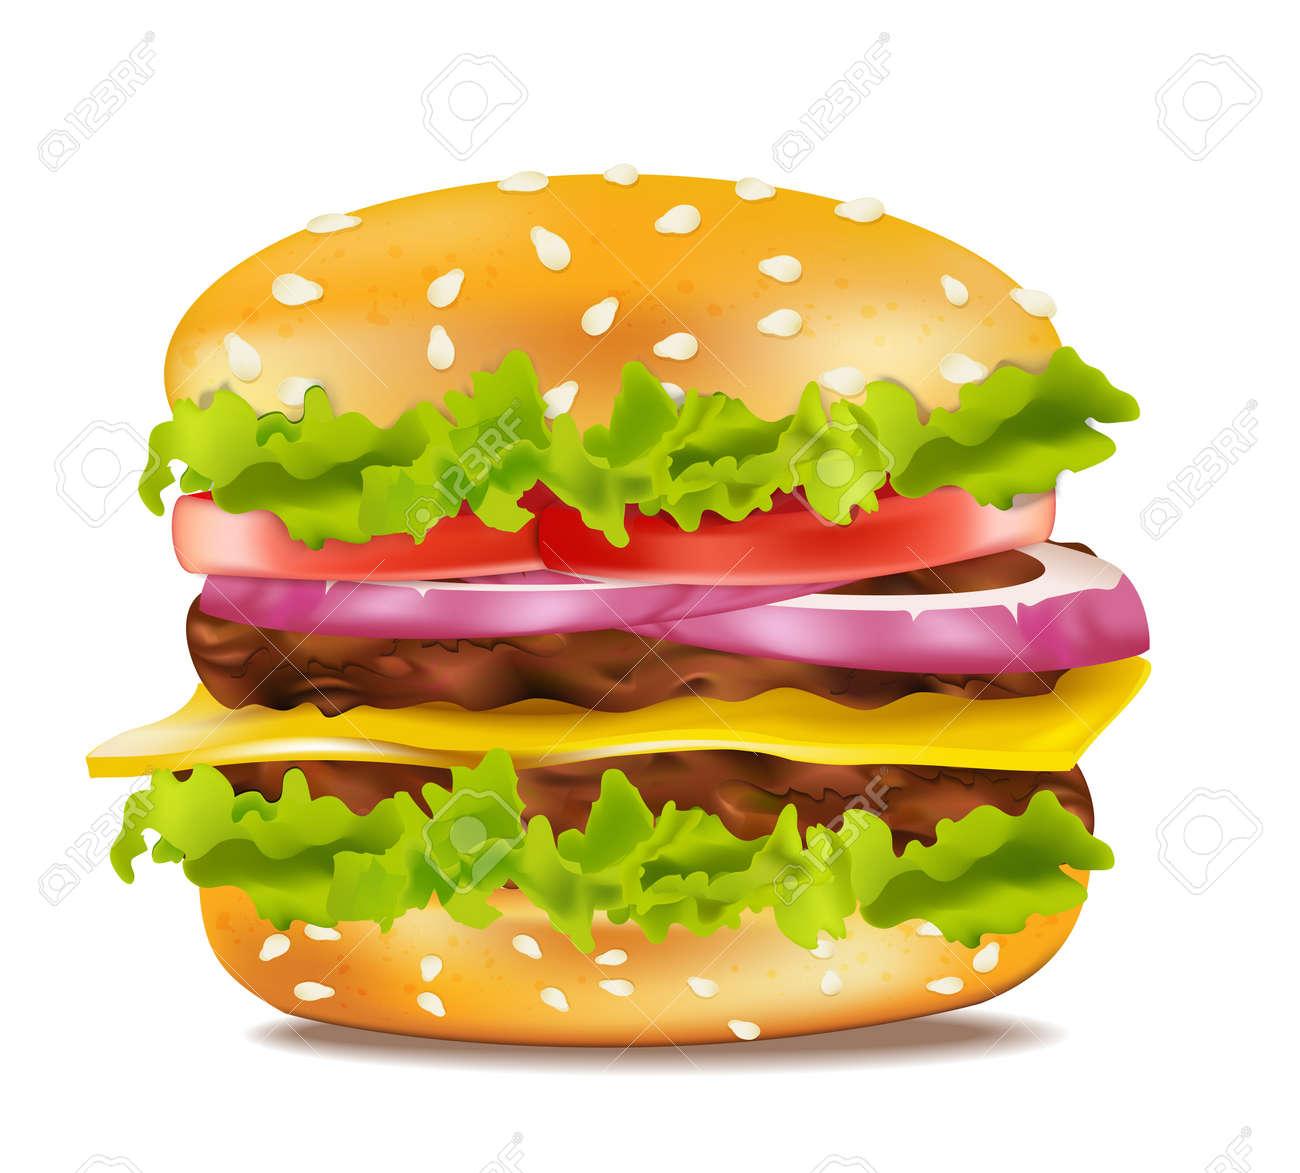 Vector cheeseburger on a white background Stock Vector - 9549740